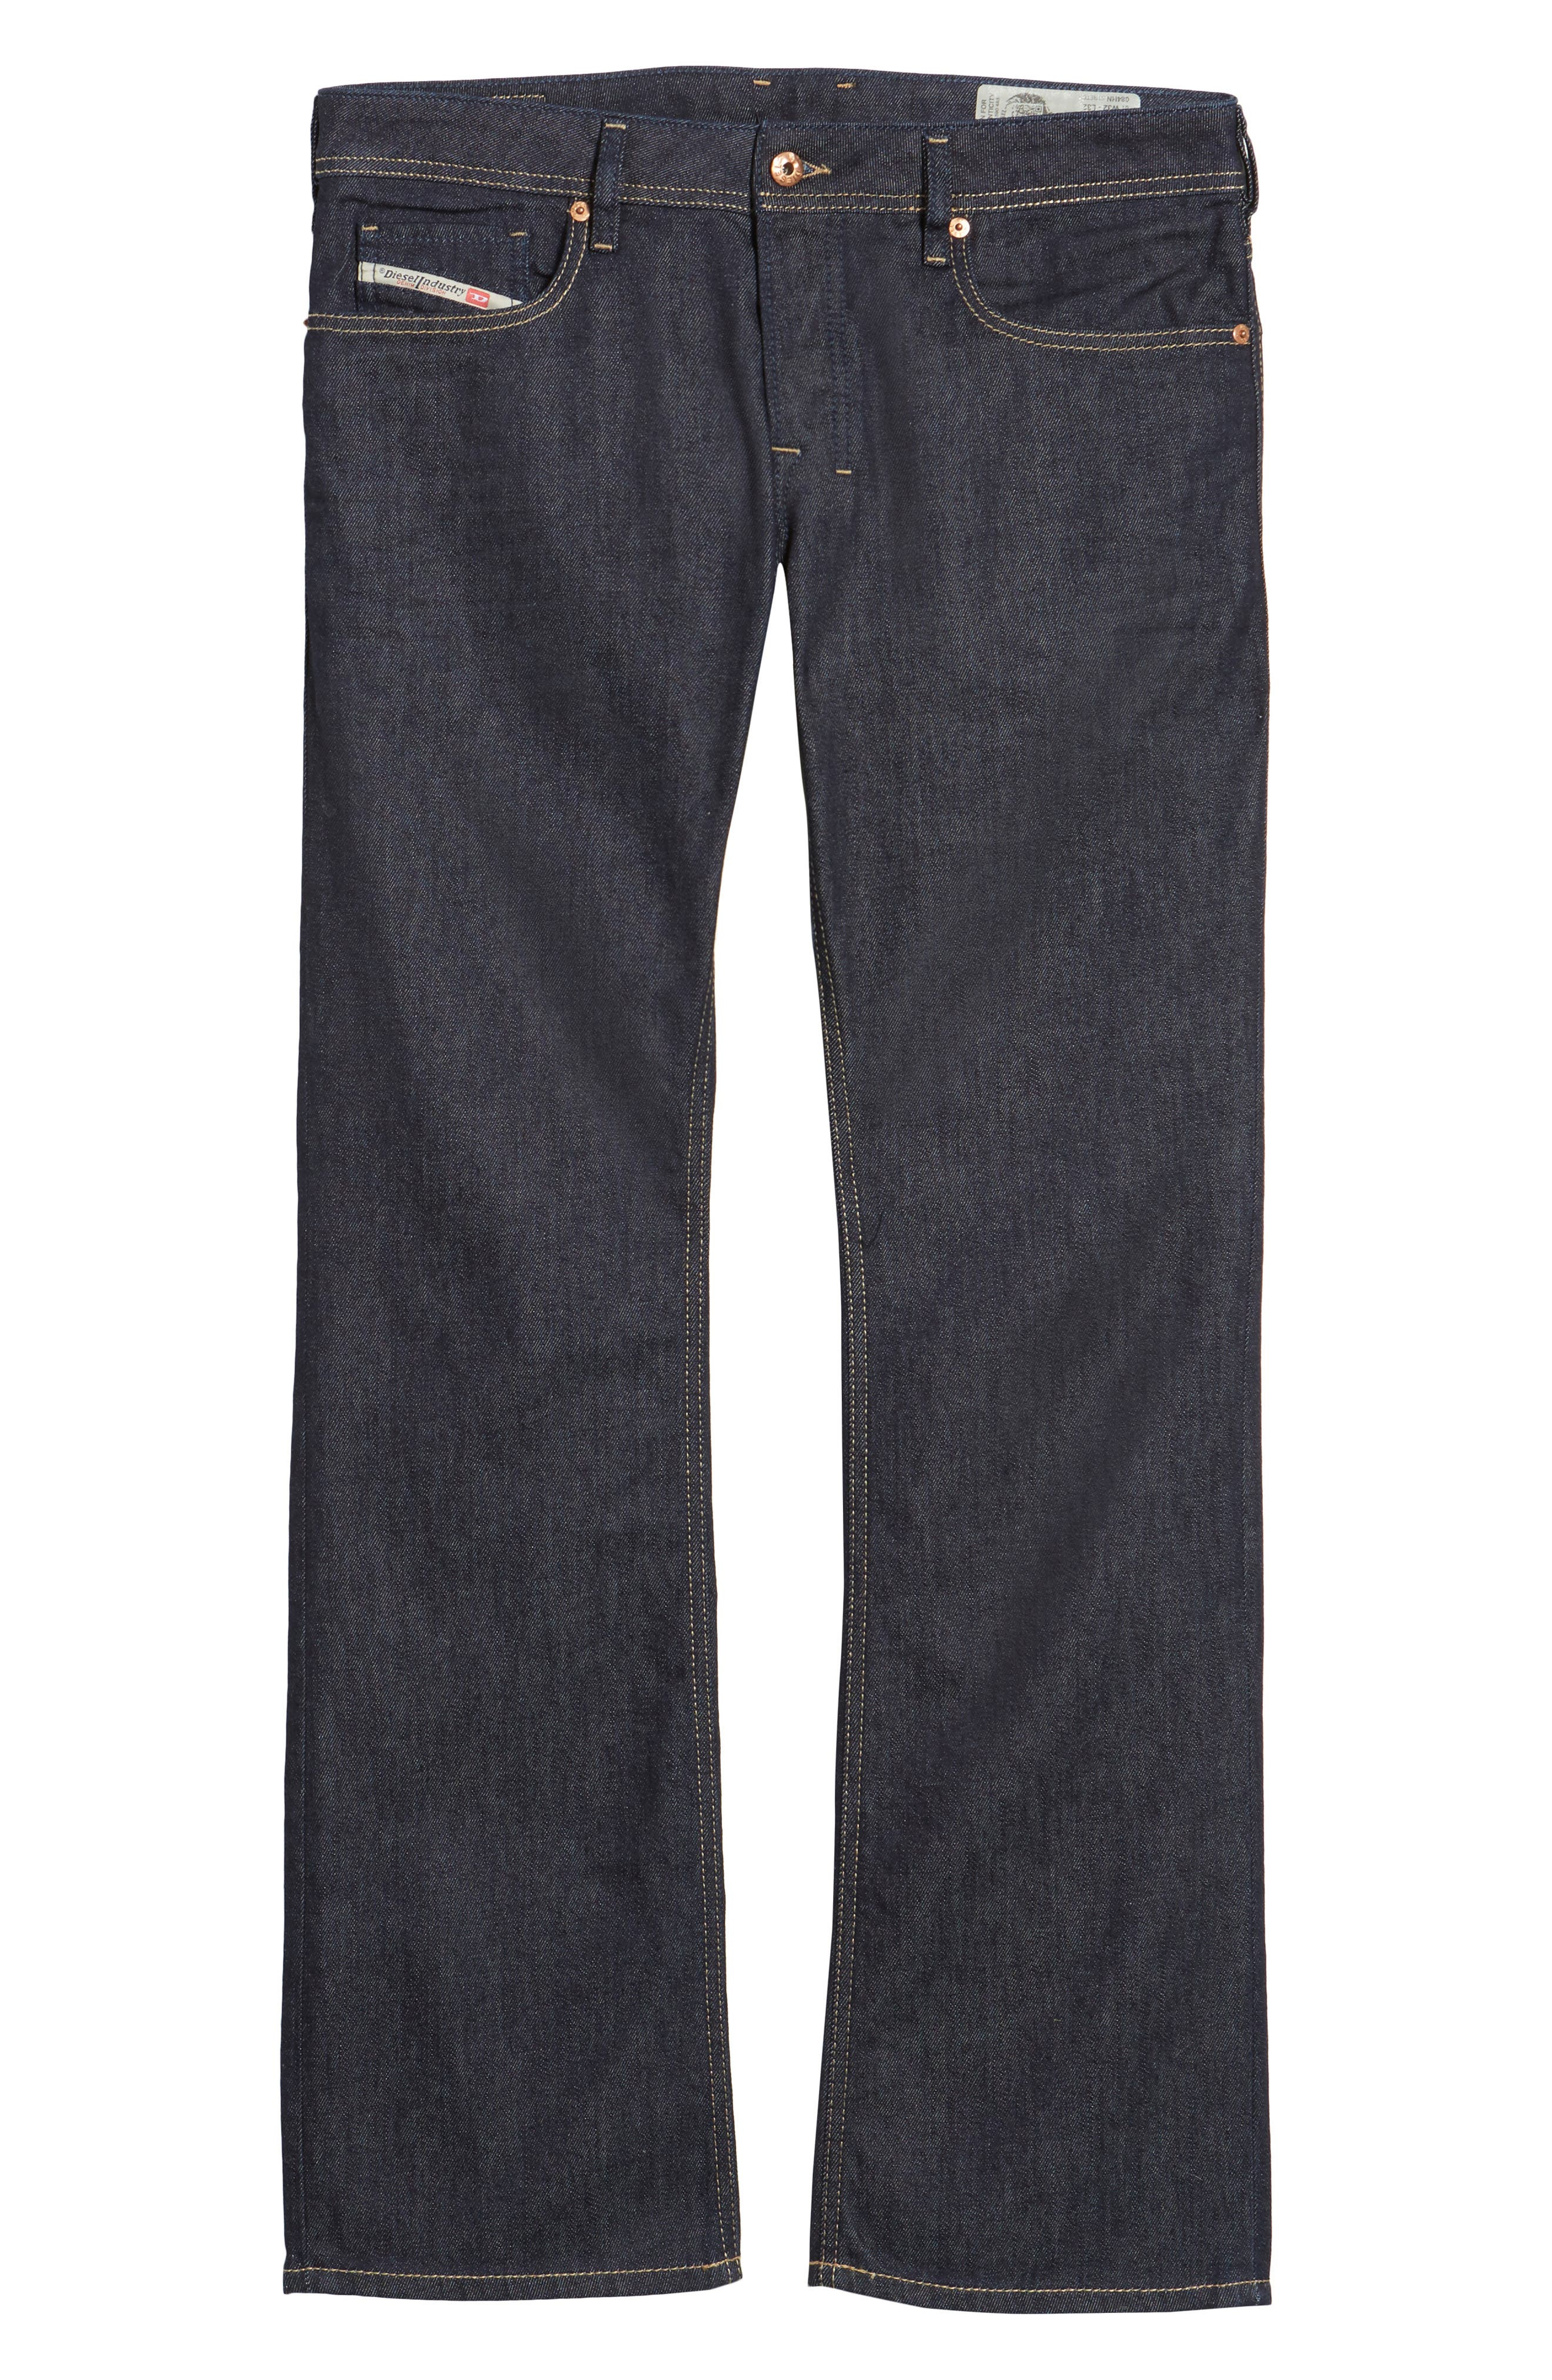 Zatiny Bootcut Jeans,                             Alternate thumbnail 6, color,                             BLUE